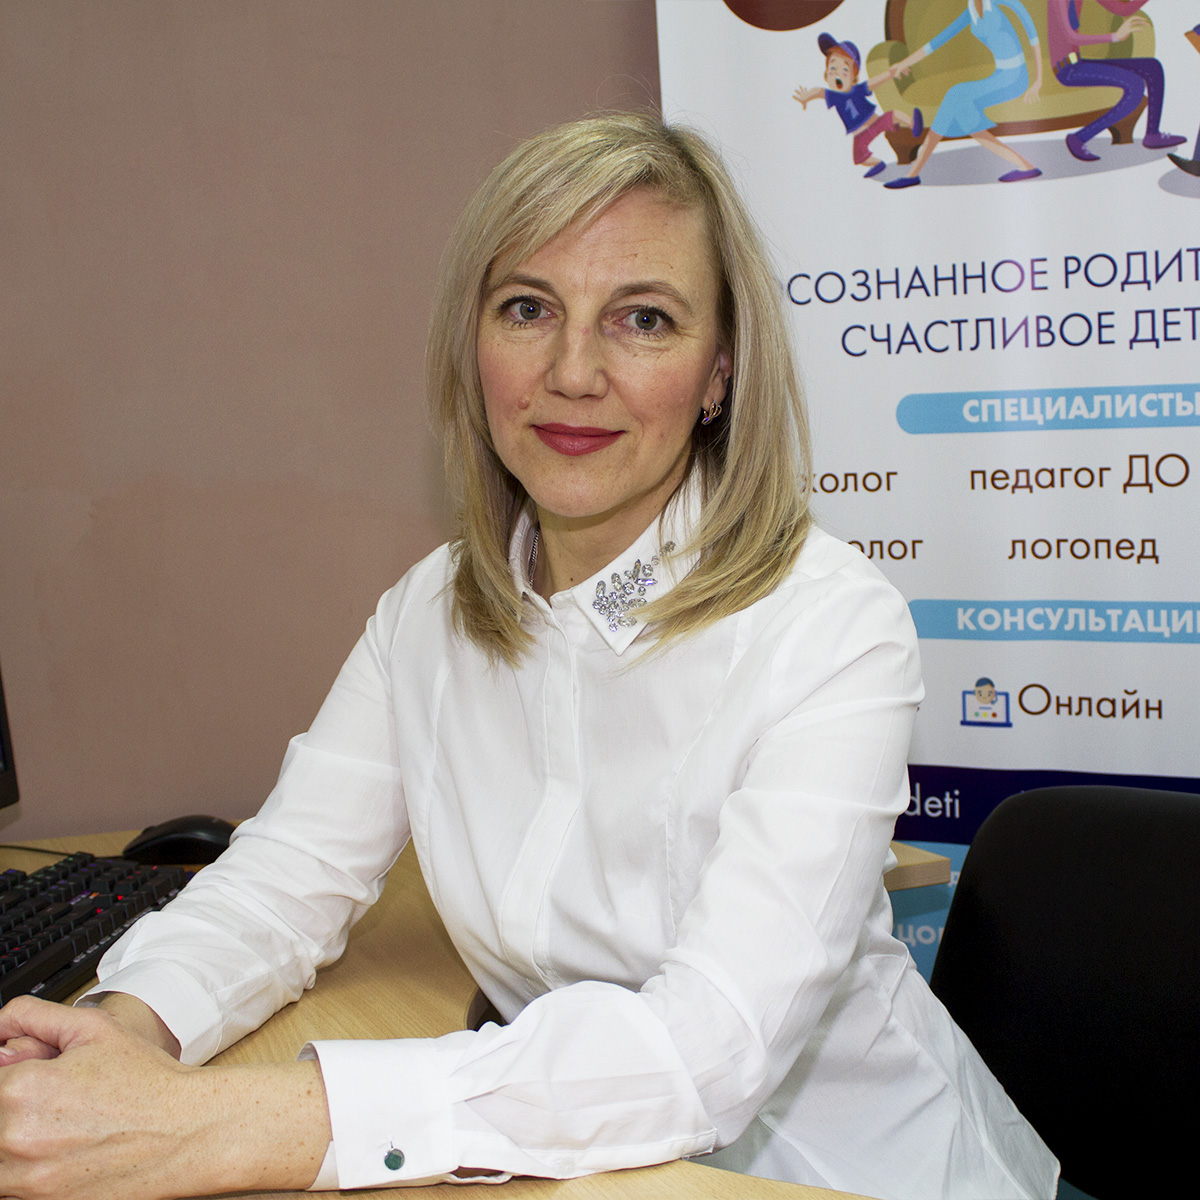 Сидякина Наталья Михайловна